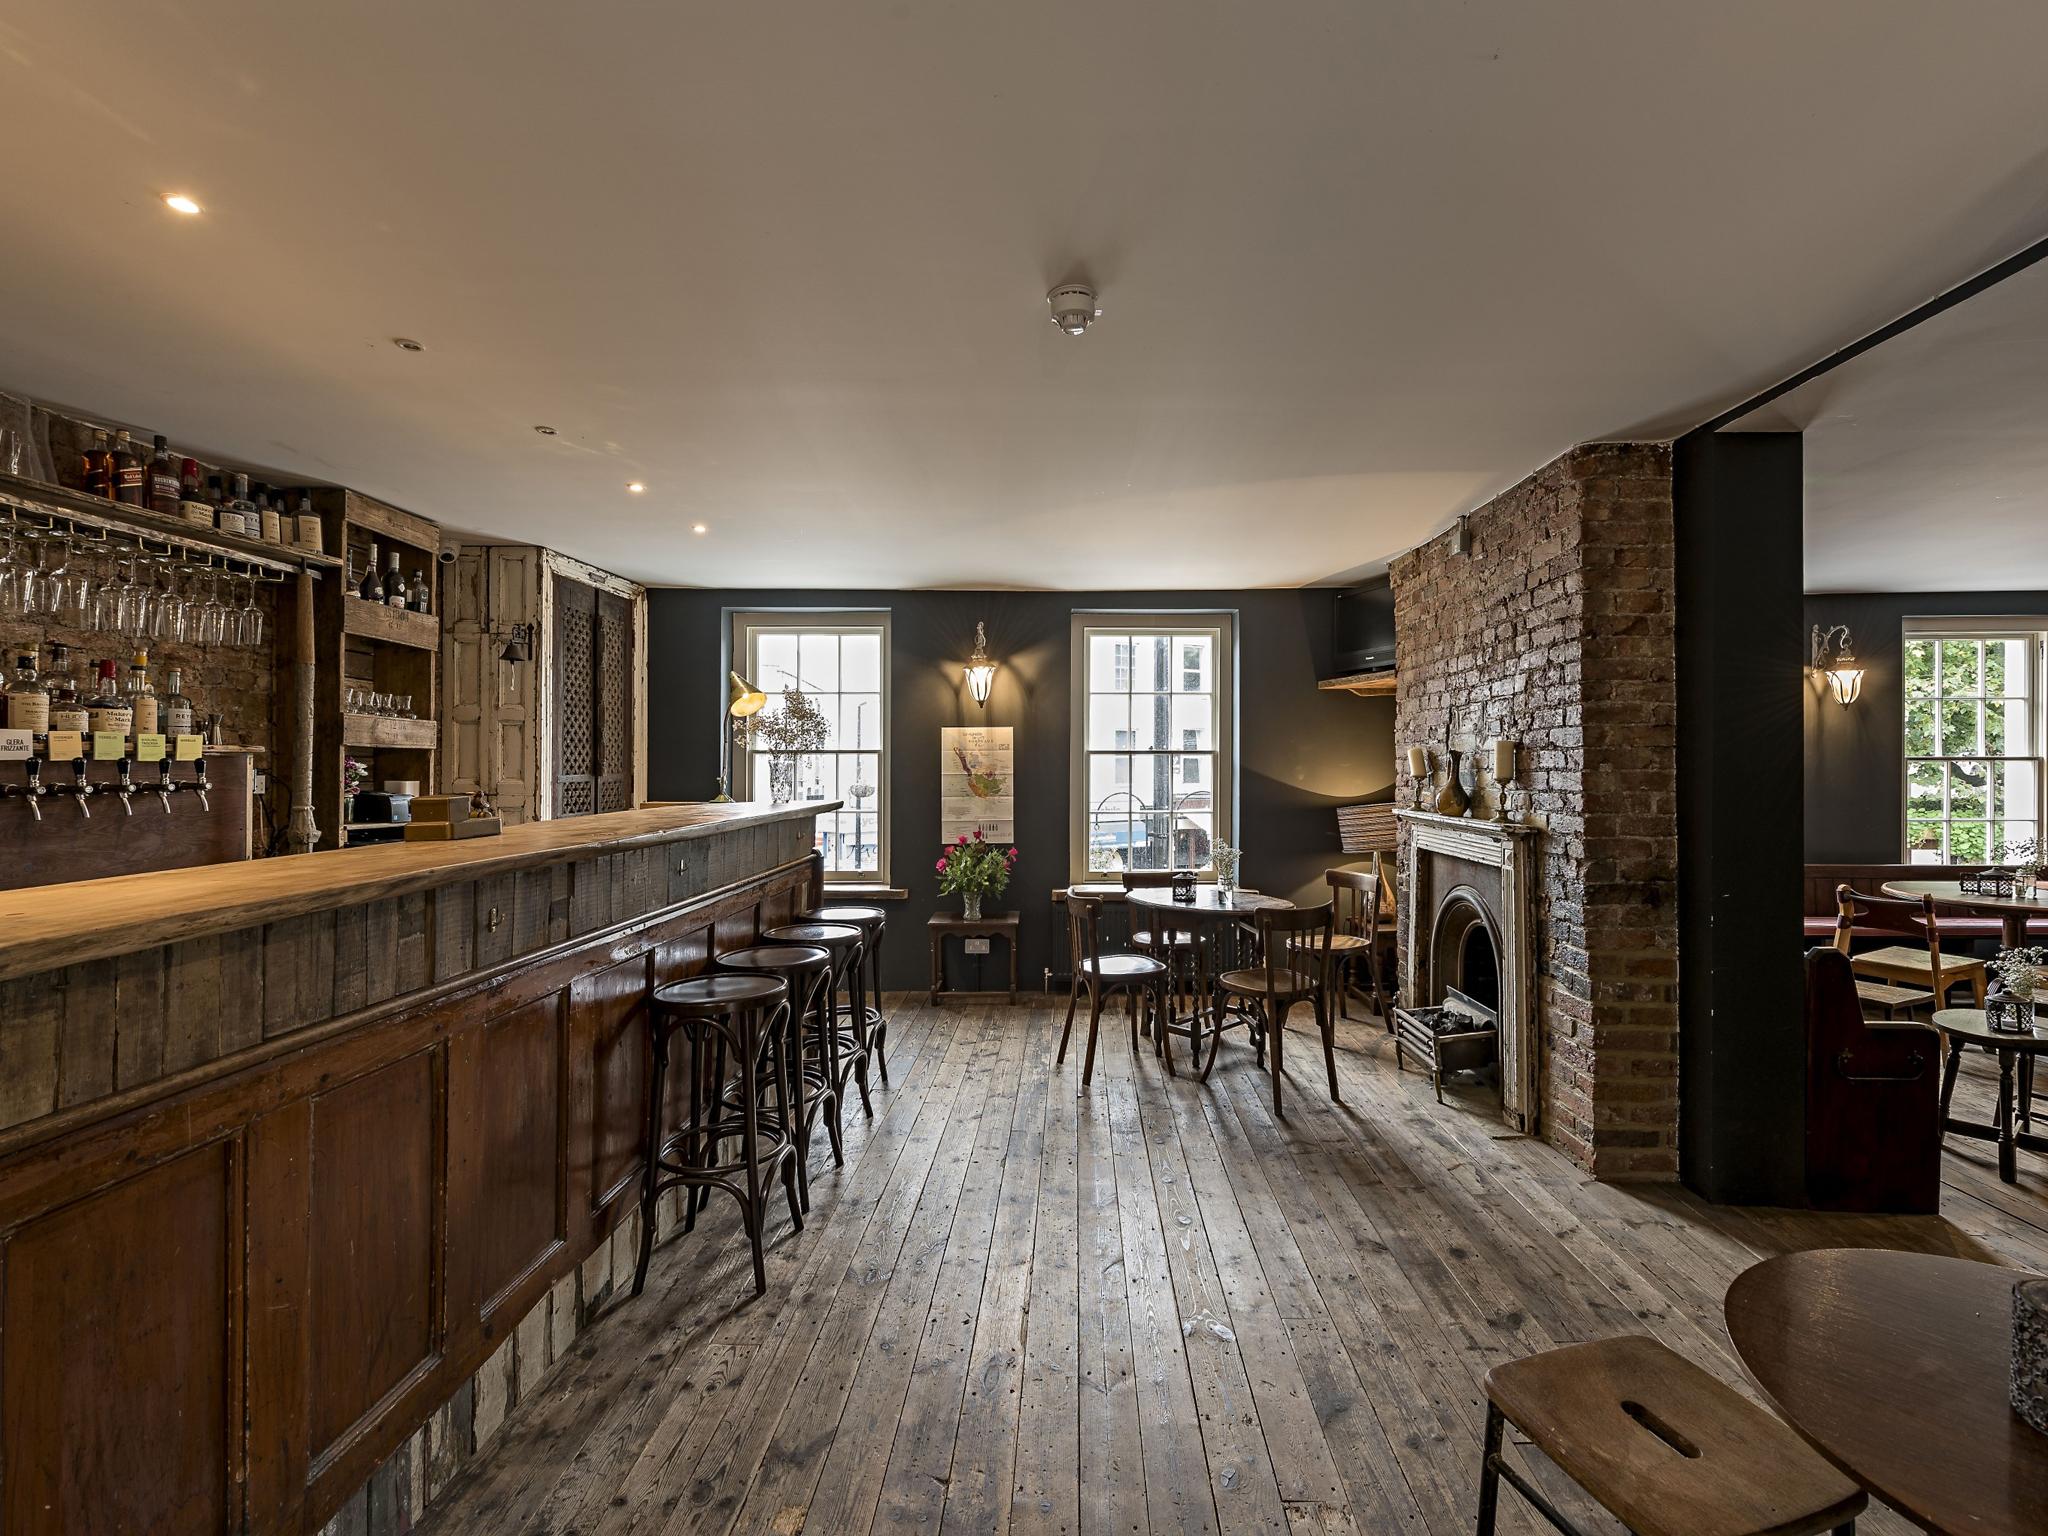 best london bridge bars, tap and bottle